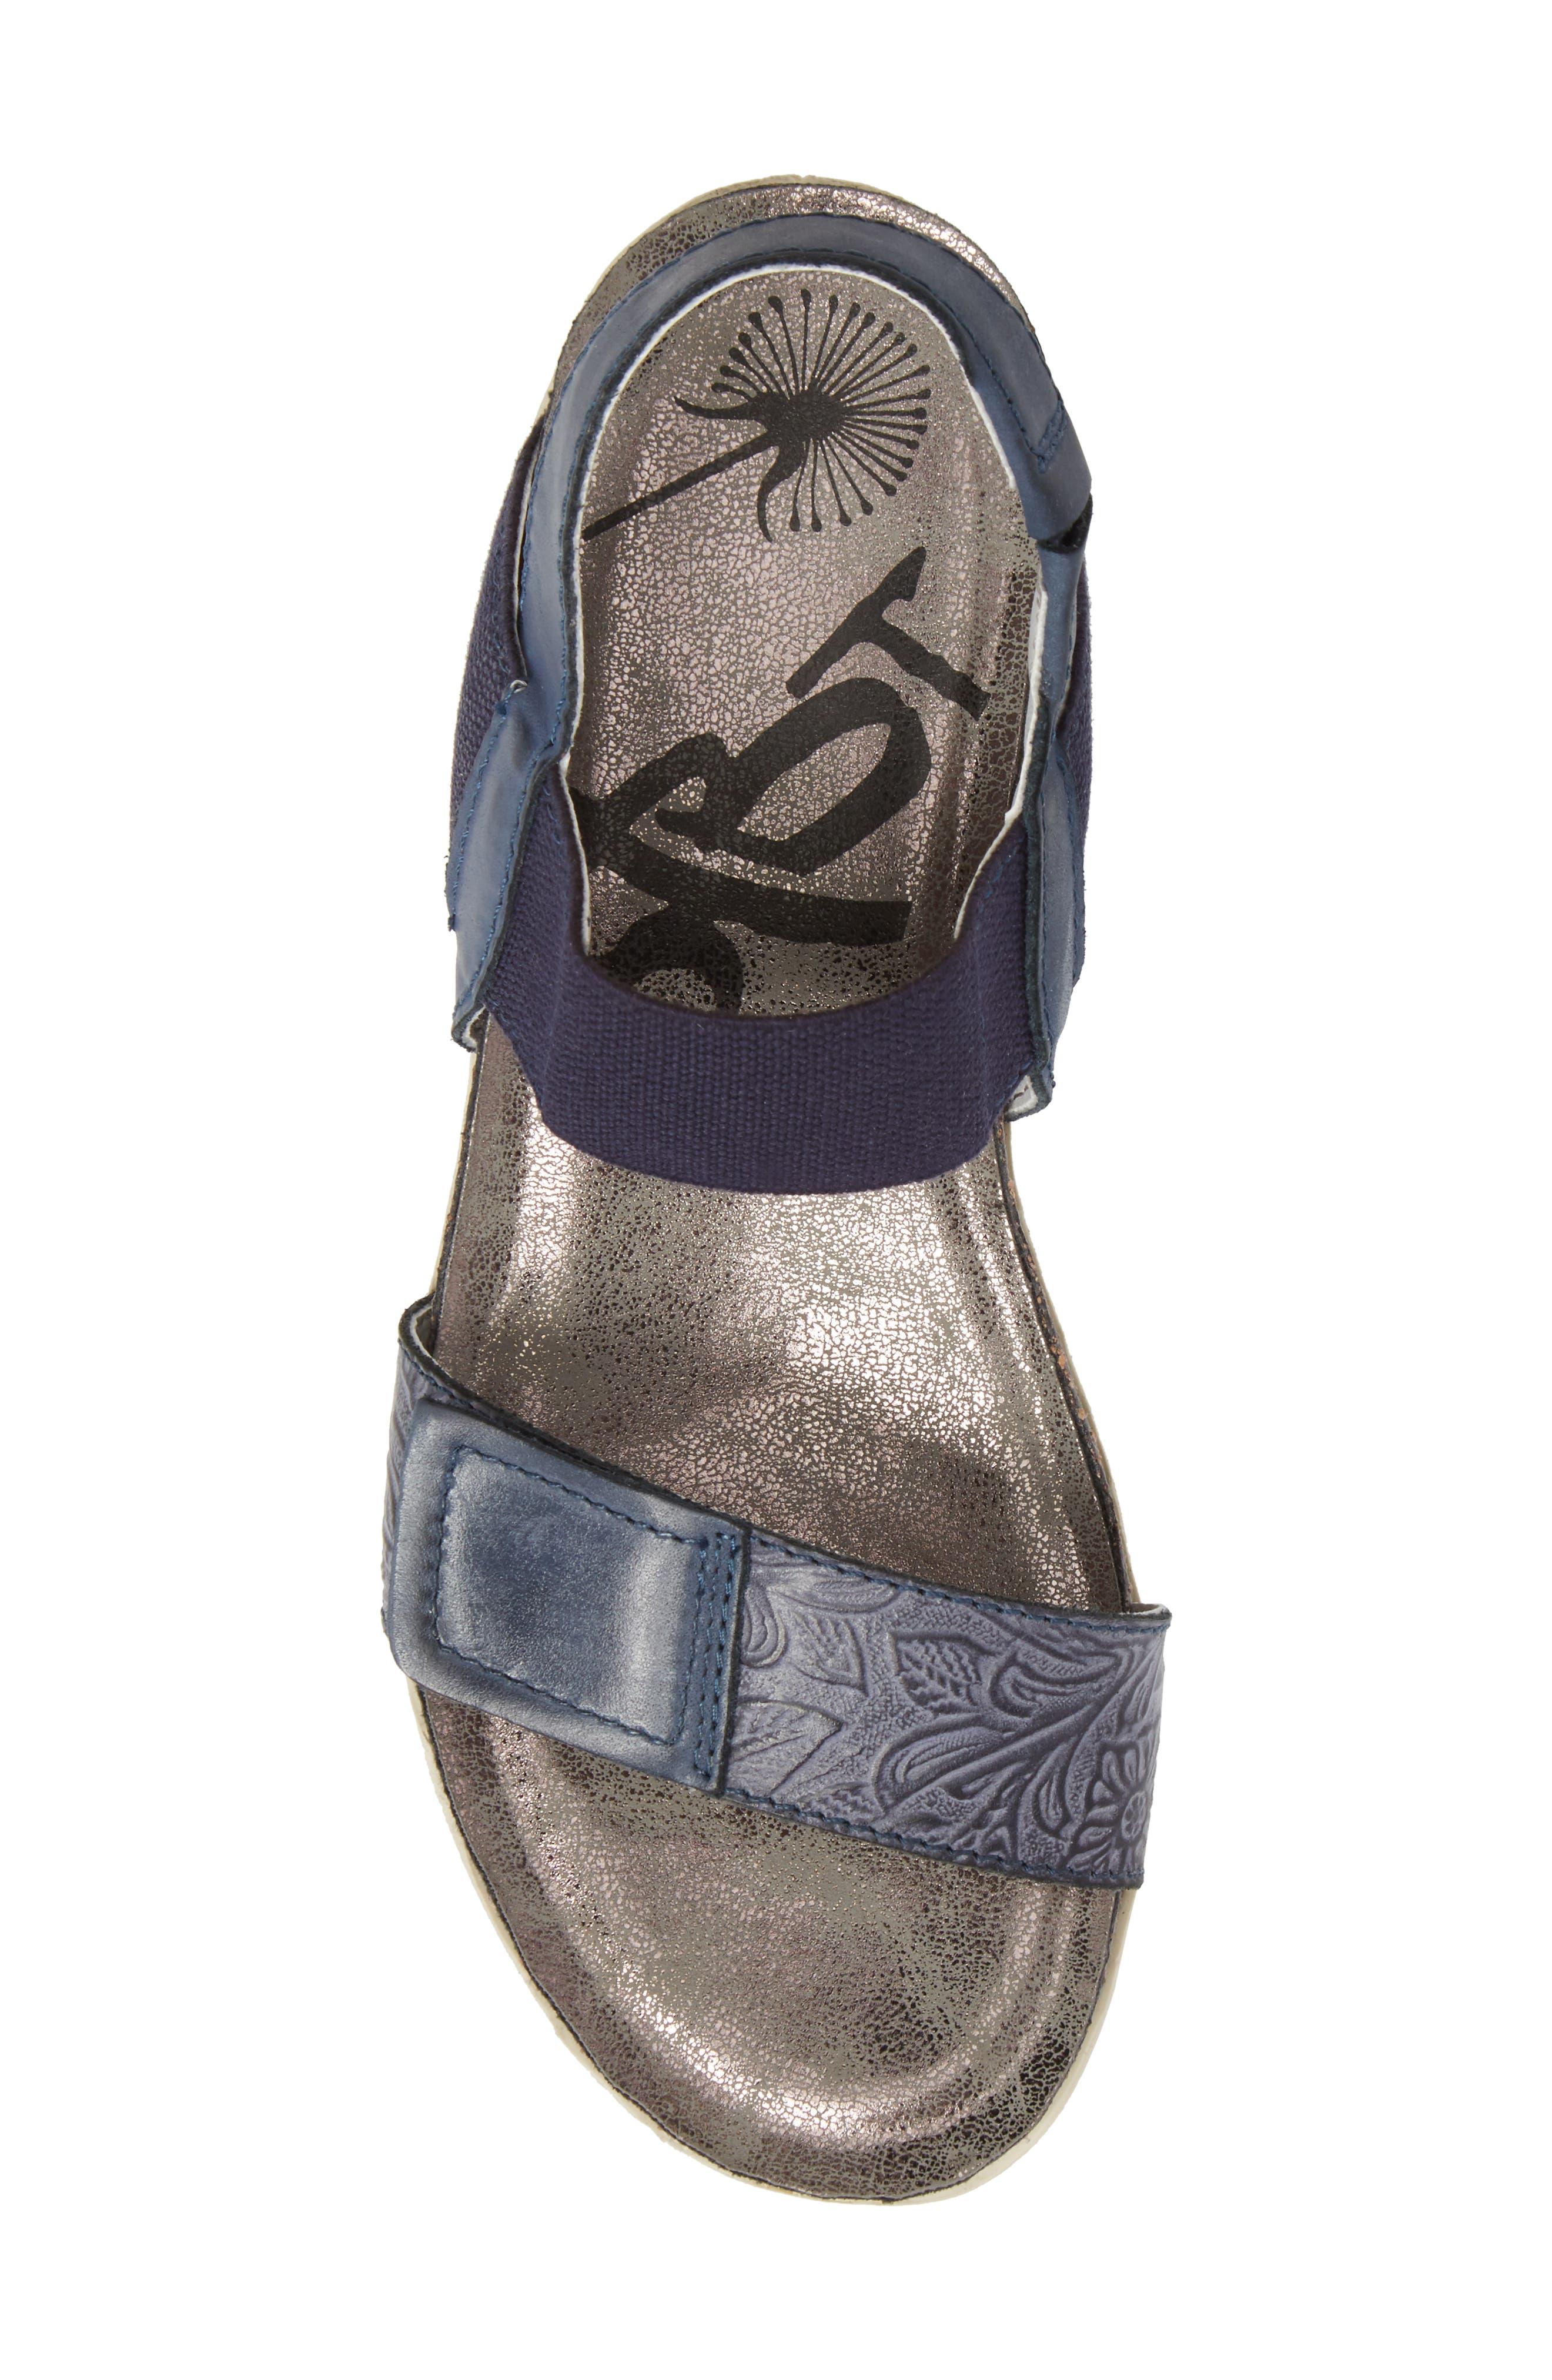 Nova Platform Sandal,                             Alternate thumbnail 5, color,                             Navy Leather